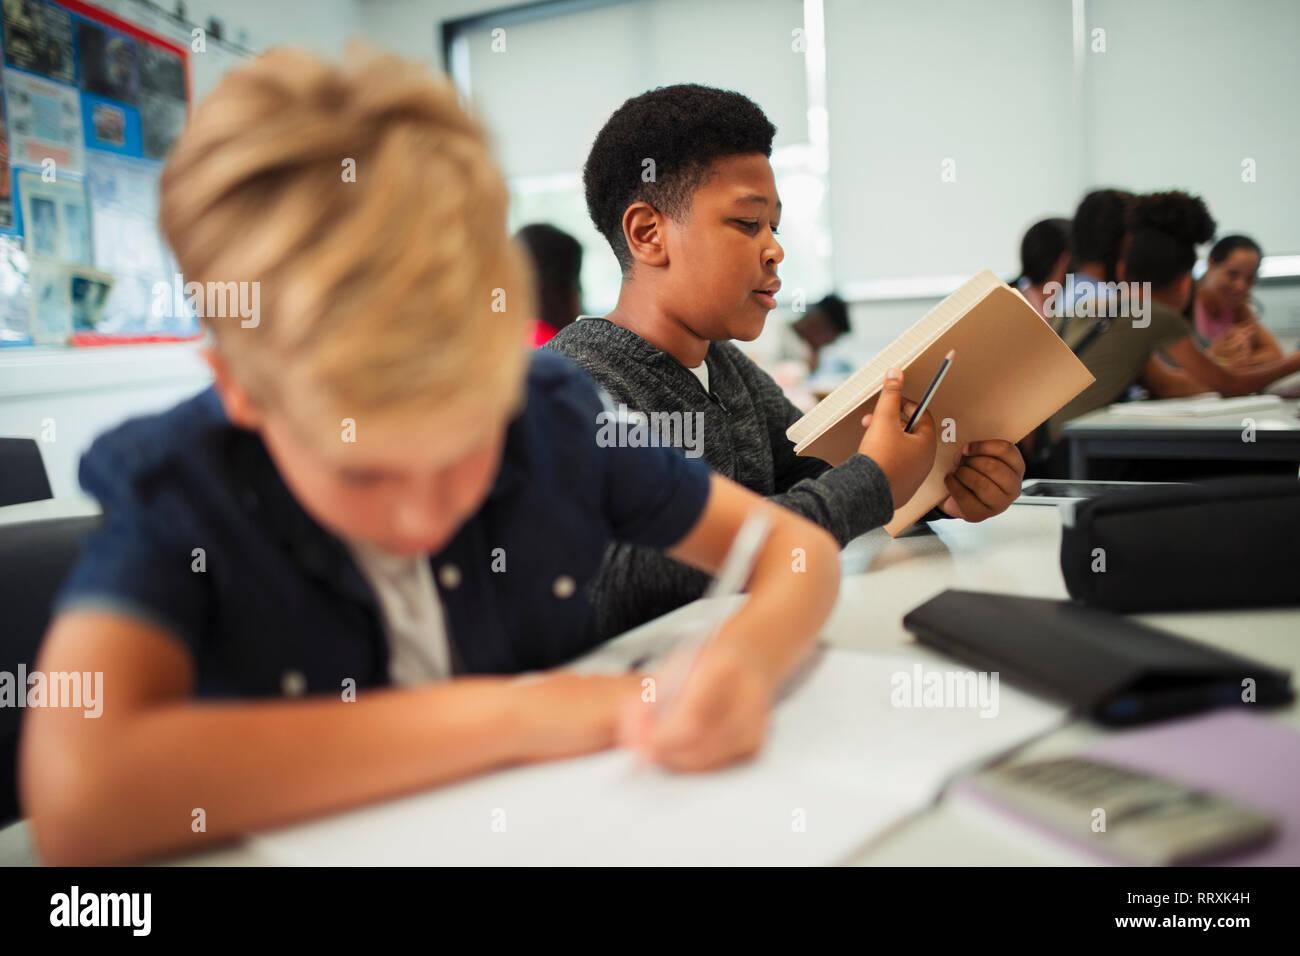 Junior high school boy opening notebook at desk in classroom Stock Photo